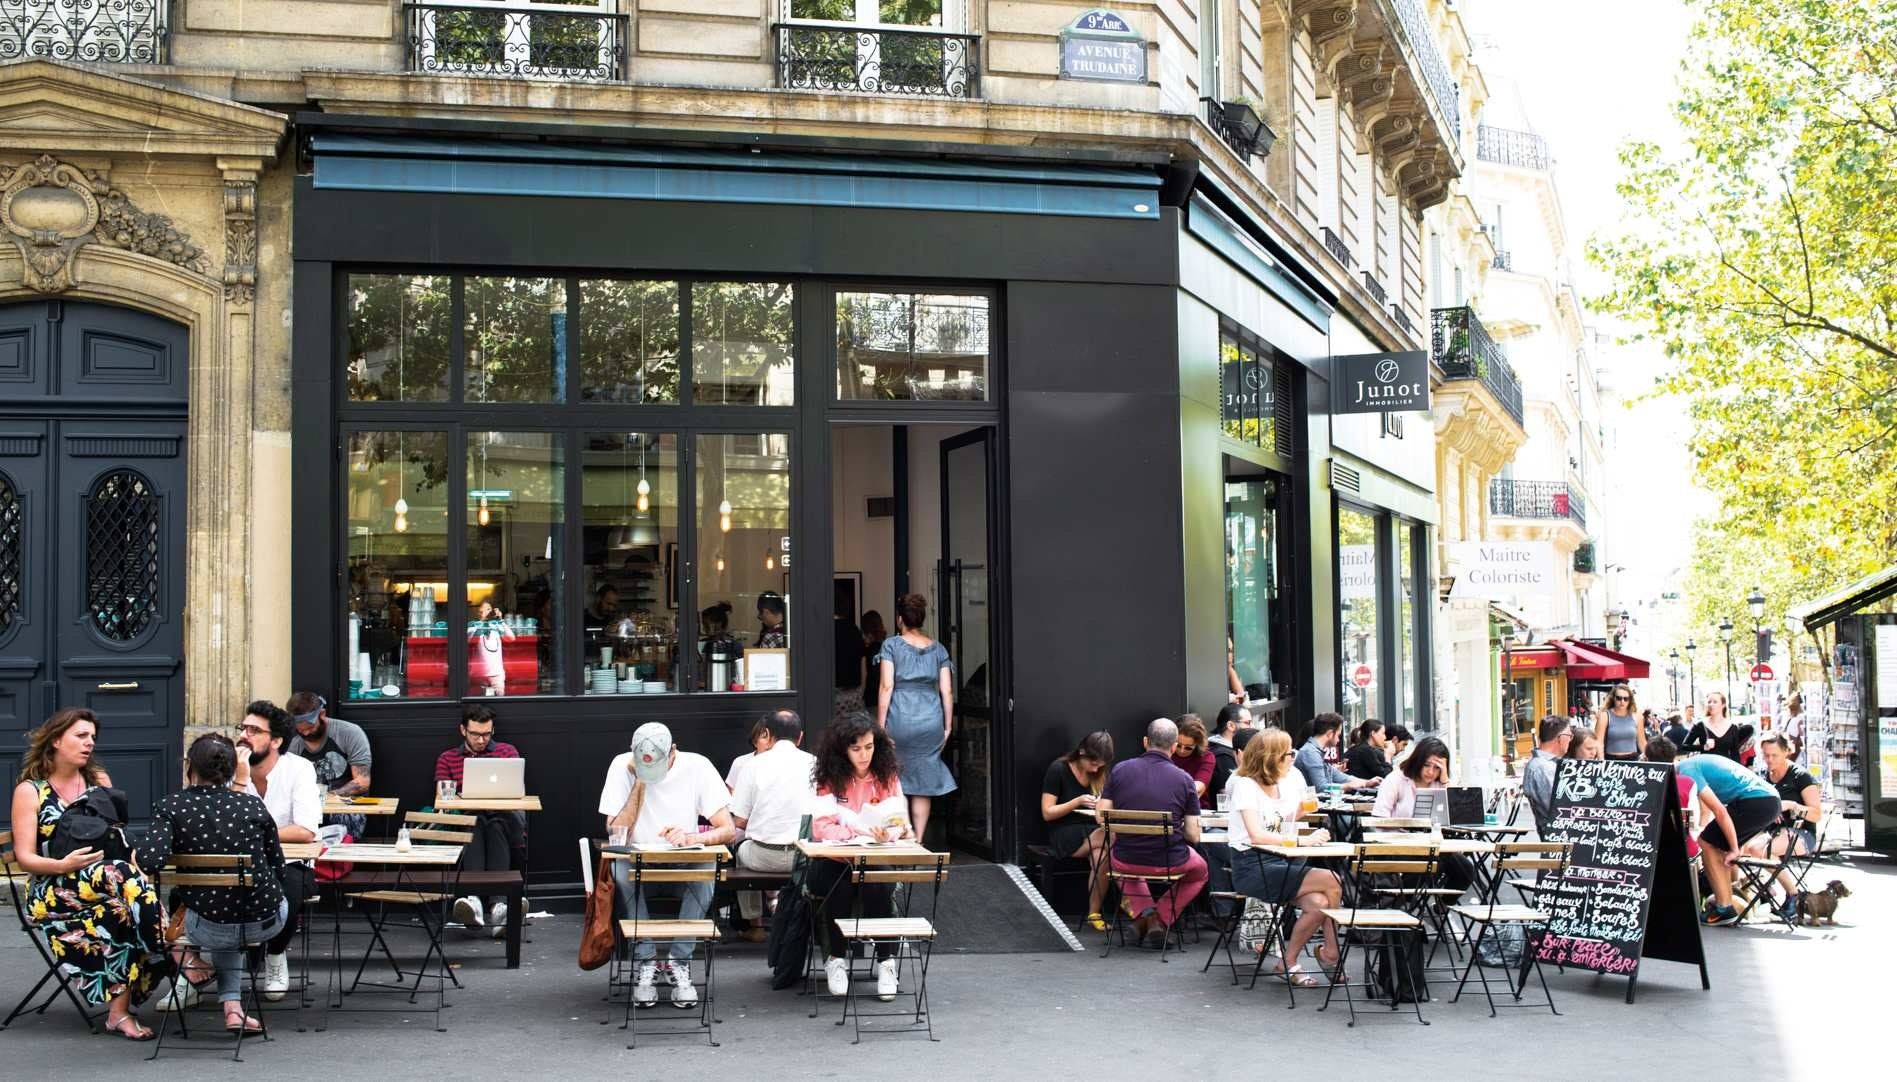 France-Paris 아이스커피에 빠진 파리지앵: The World News (6)